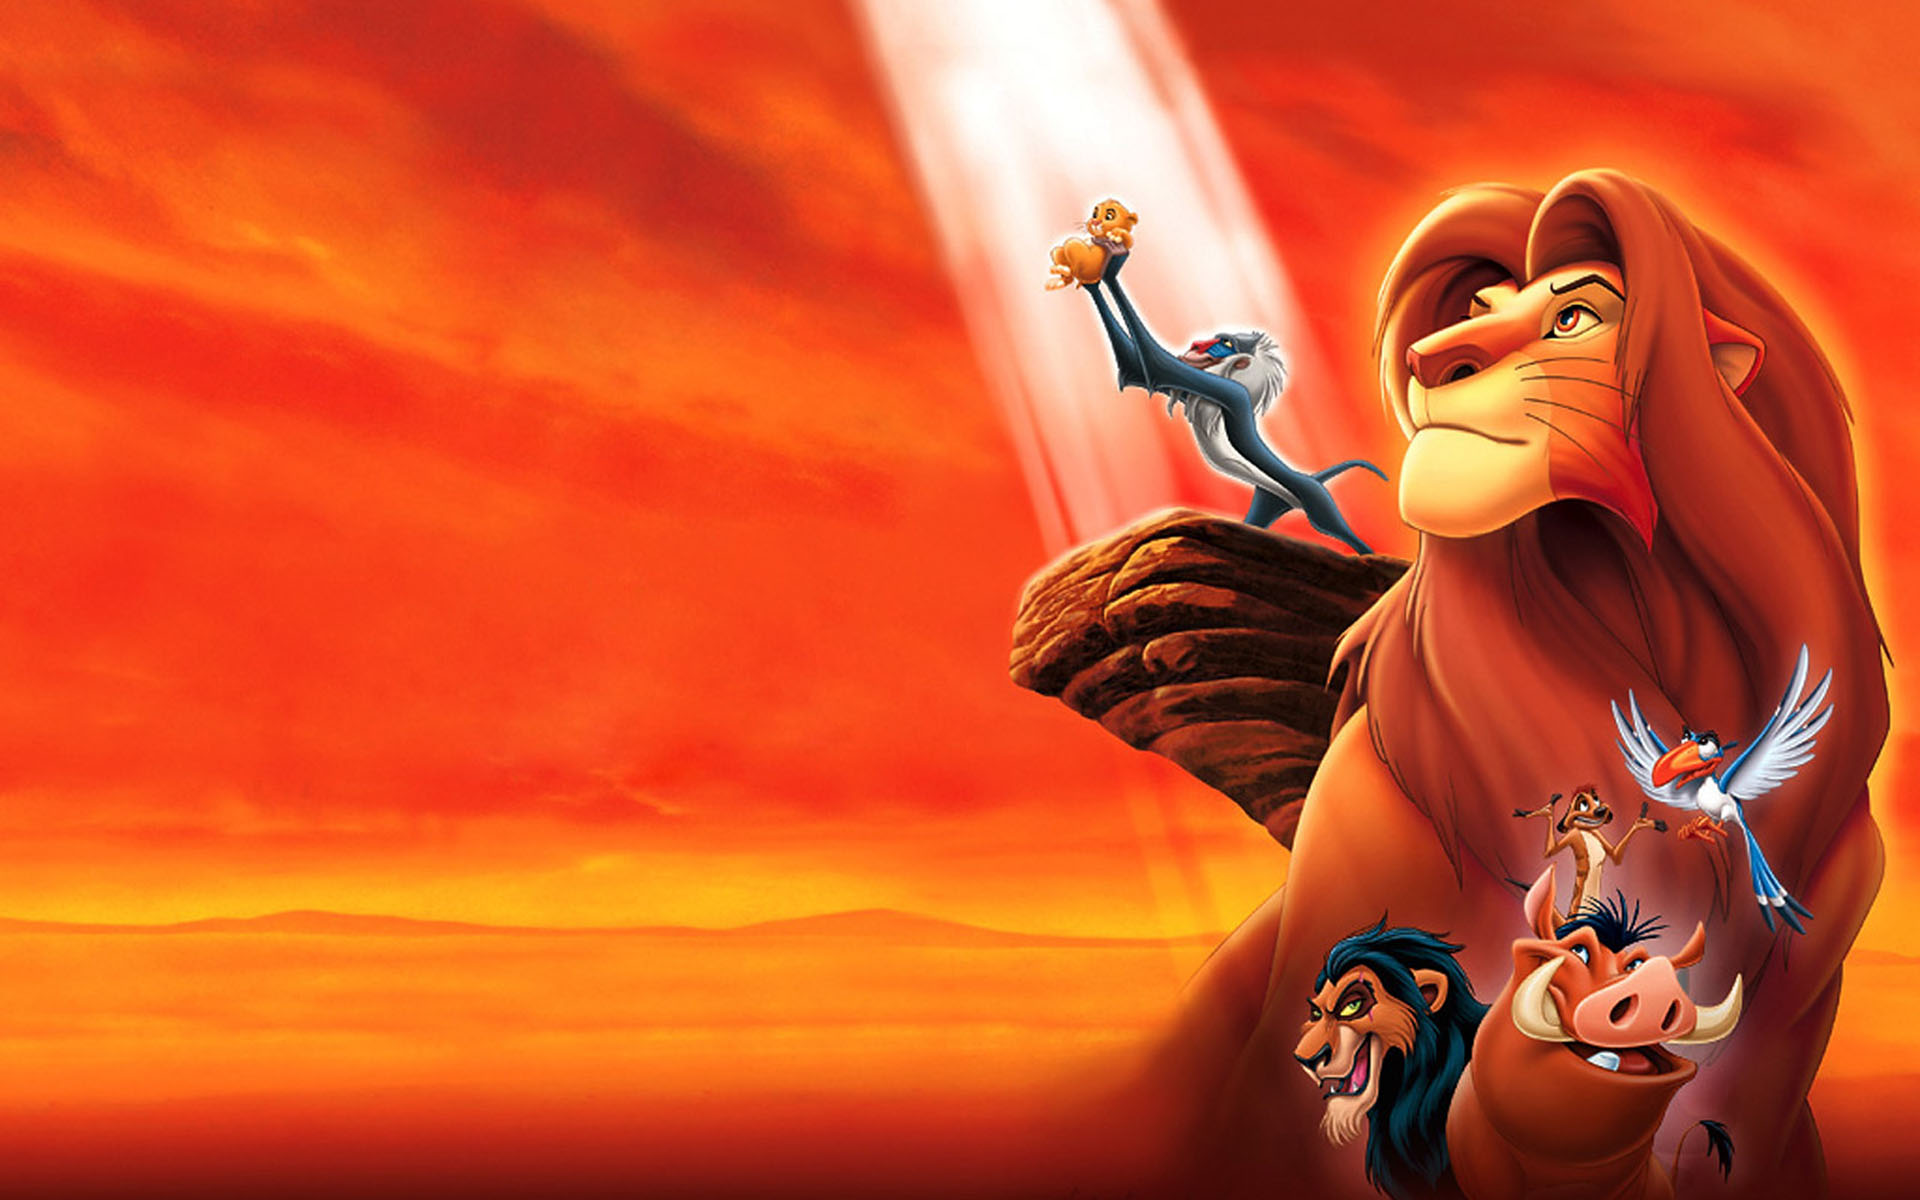 http://ozznurdgn.files.wordpress.com/2014/08/aslan-kral-the-lion-king-walt-disney-film.jpg